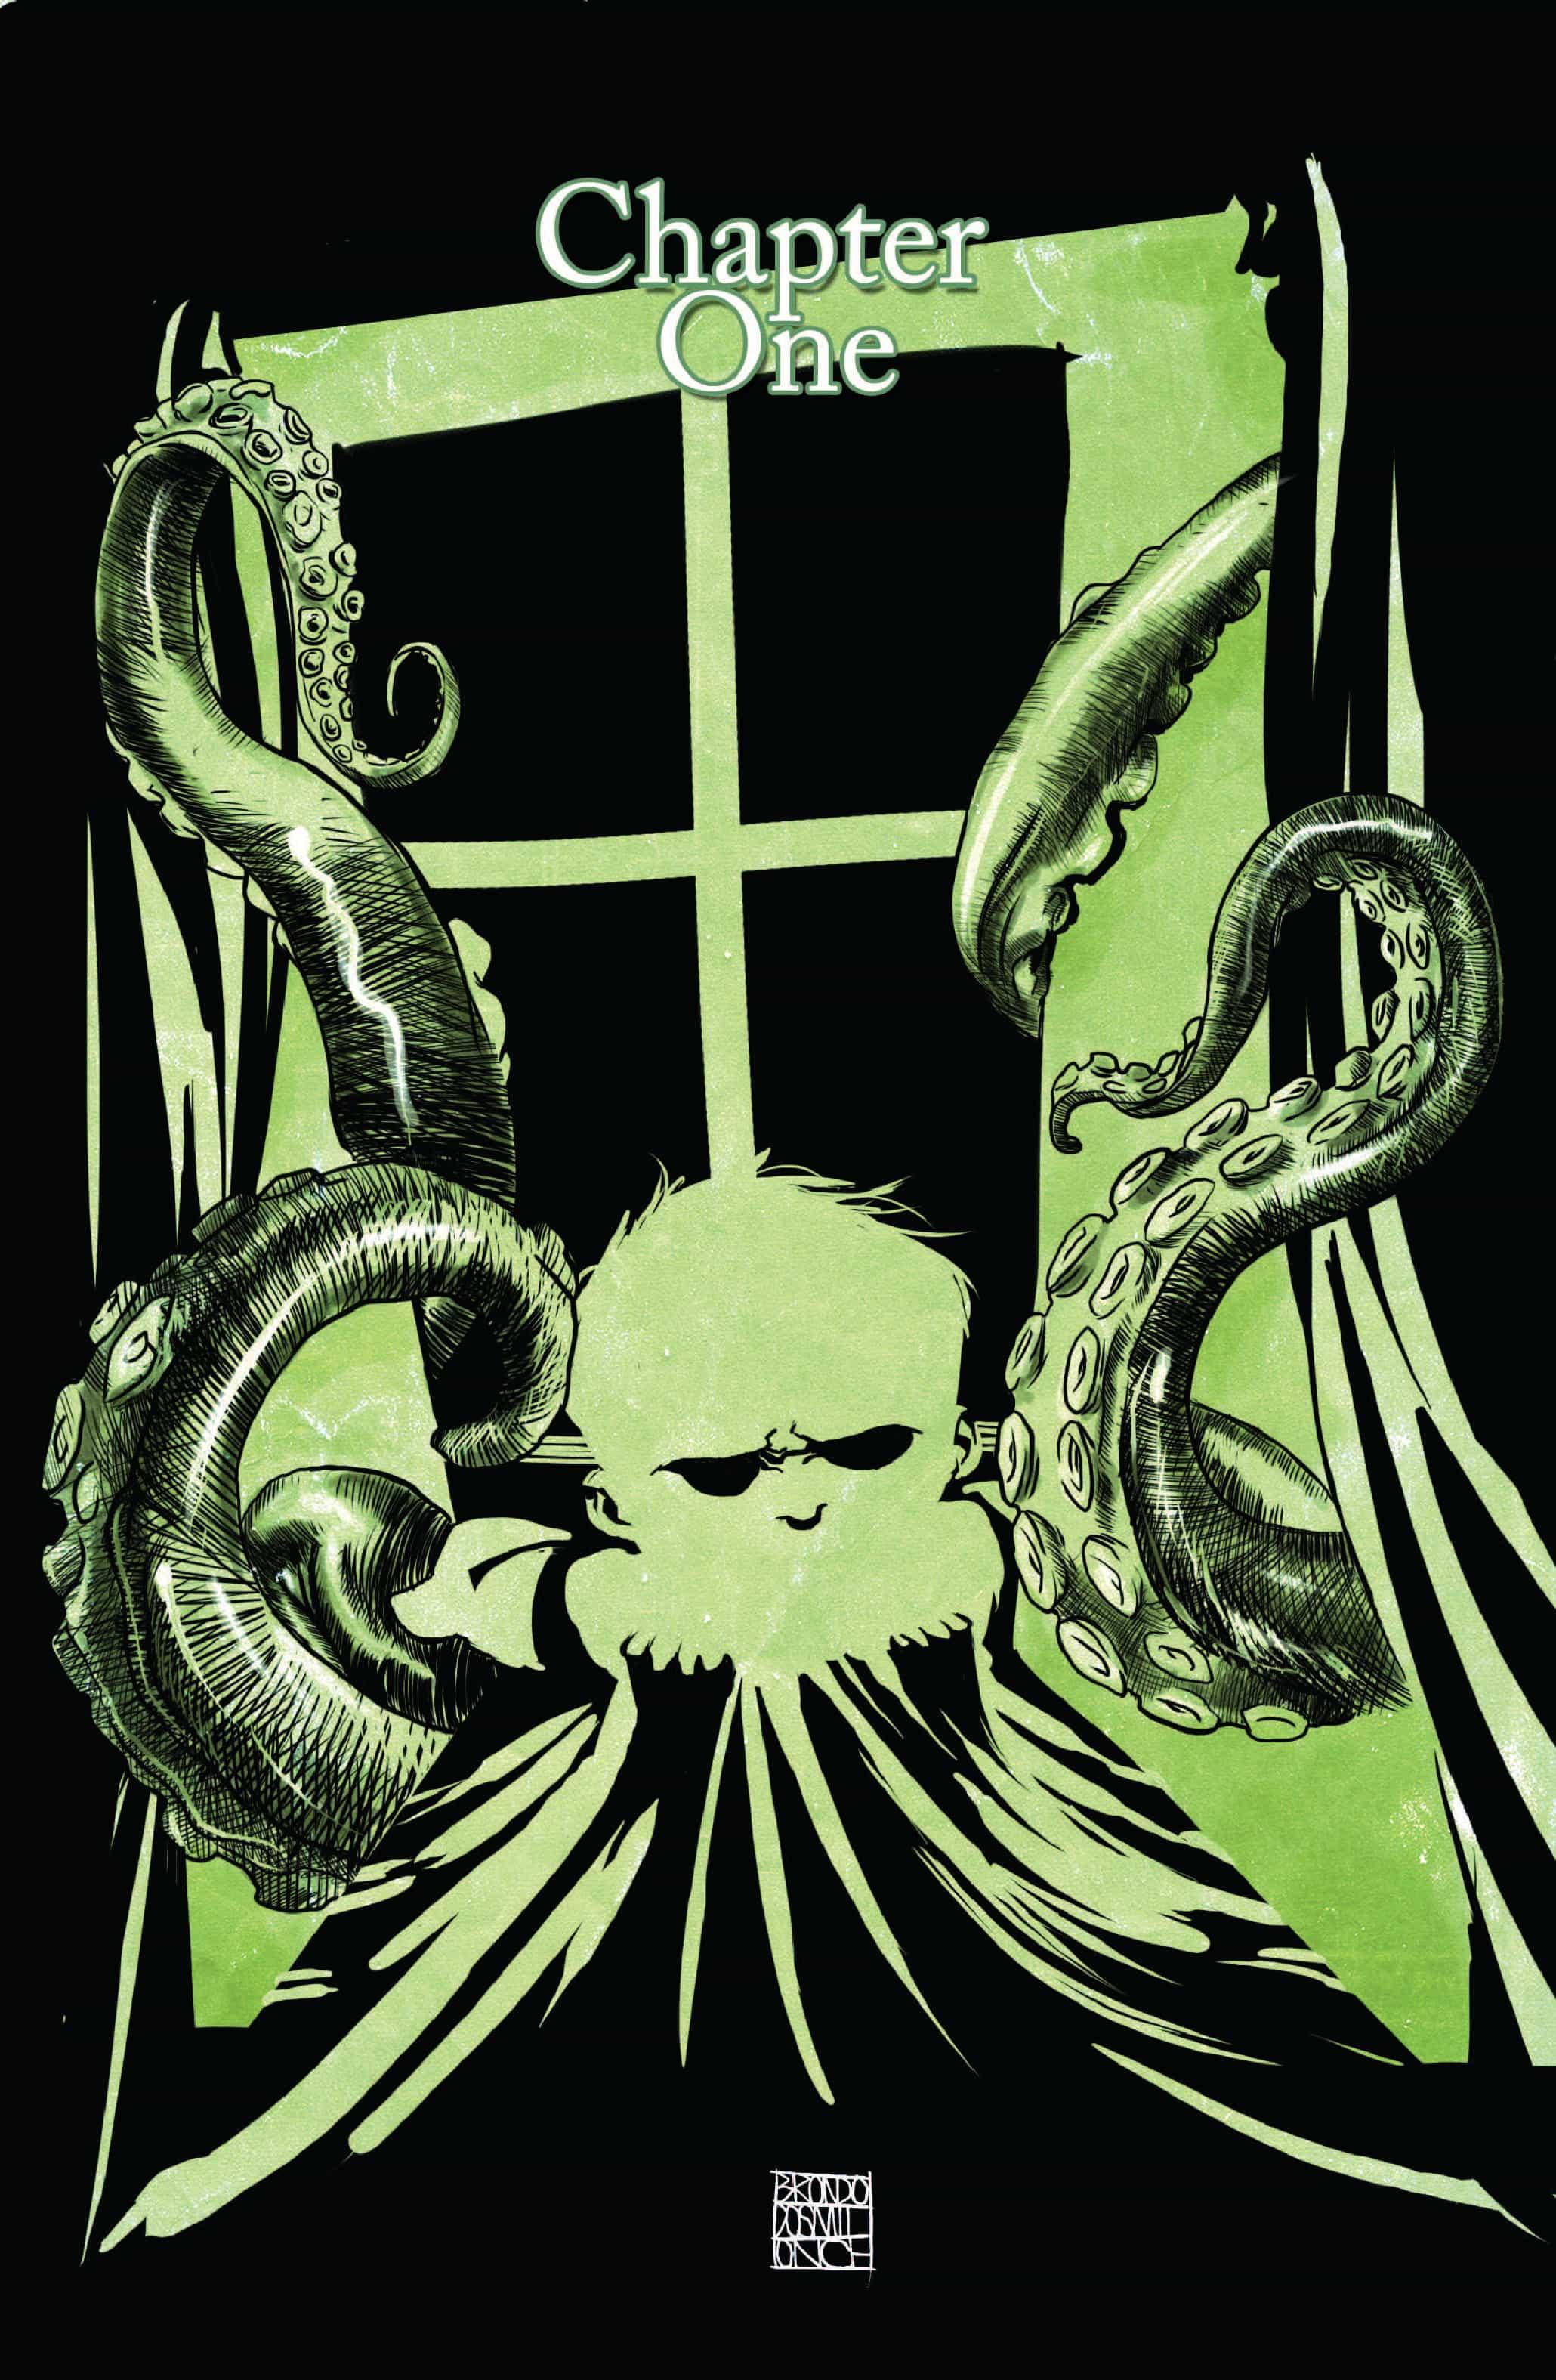 Howard_Lovecraft_Three_Kingdoms-300dpi-80